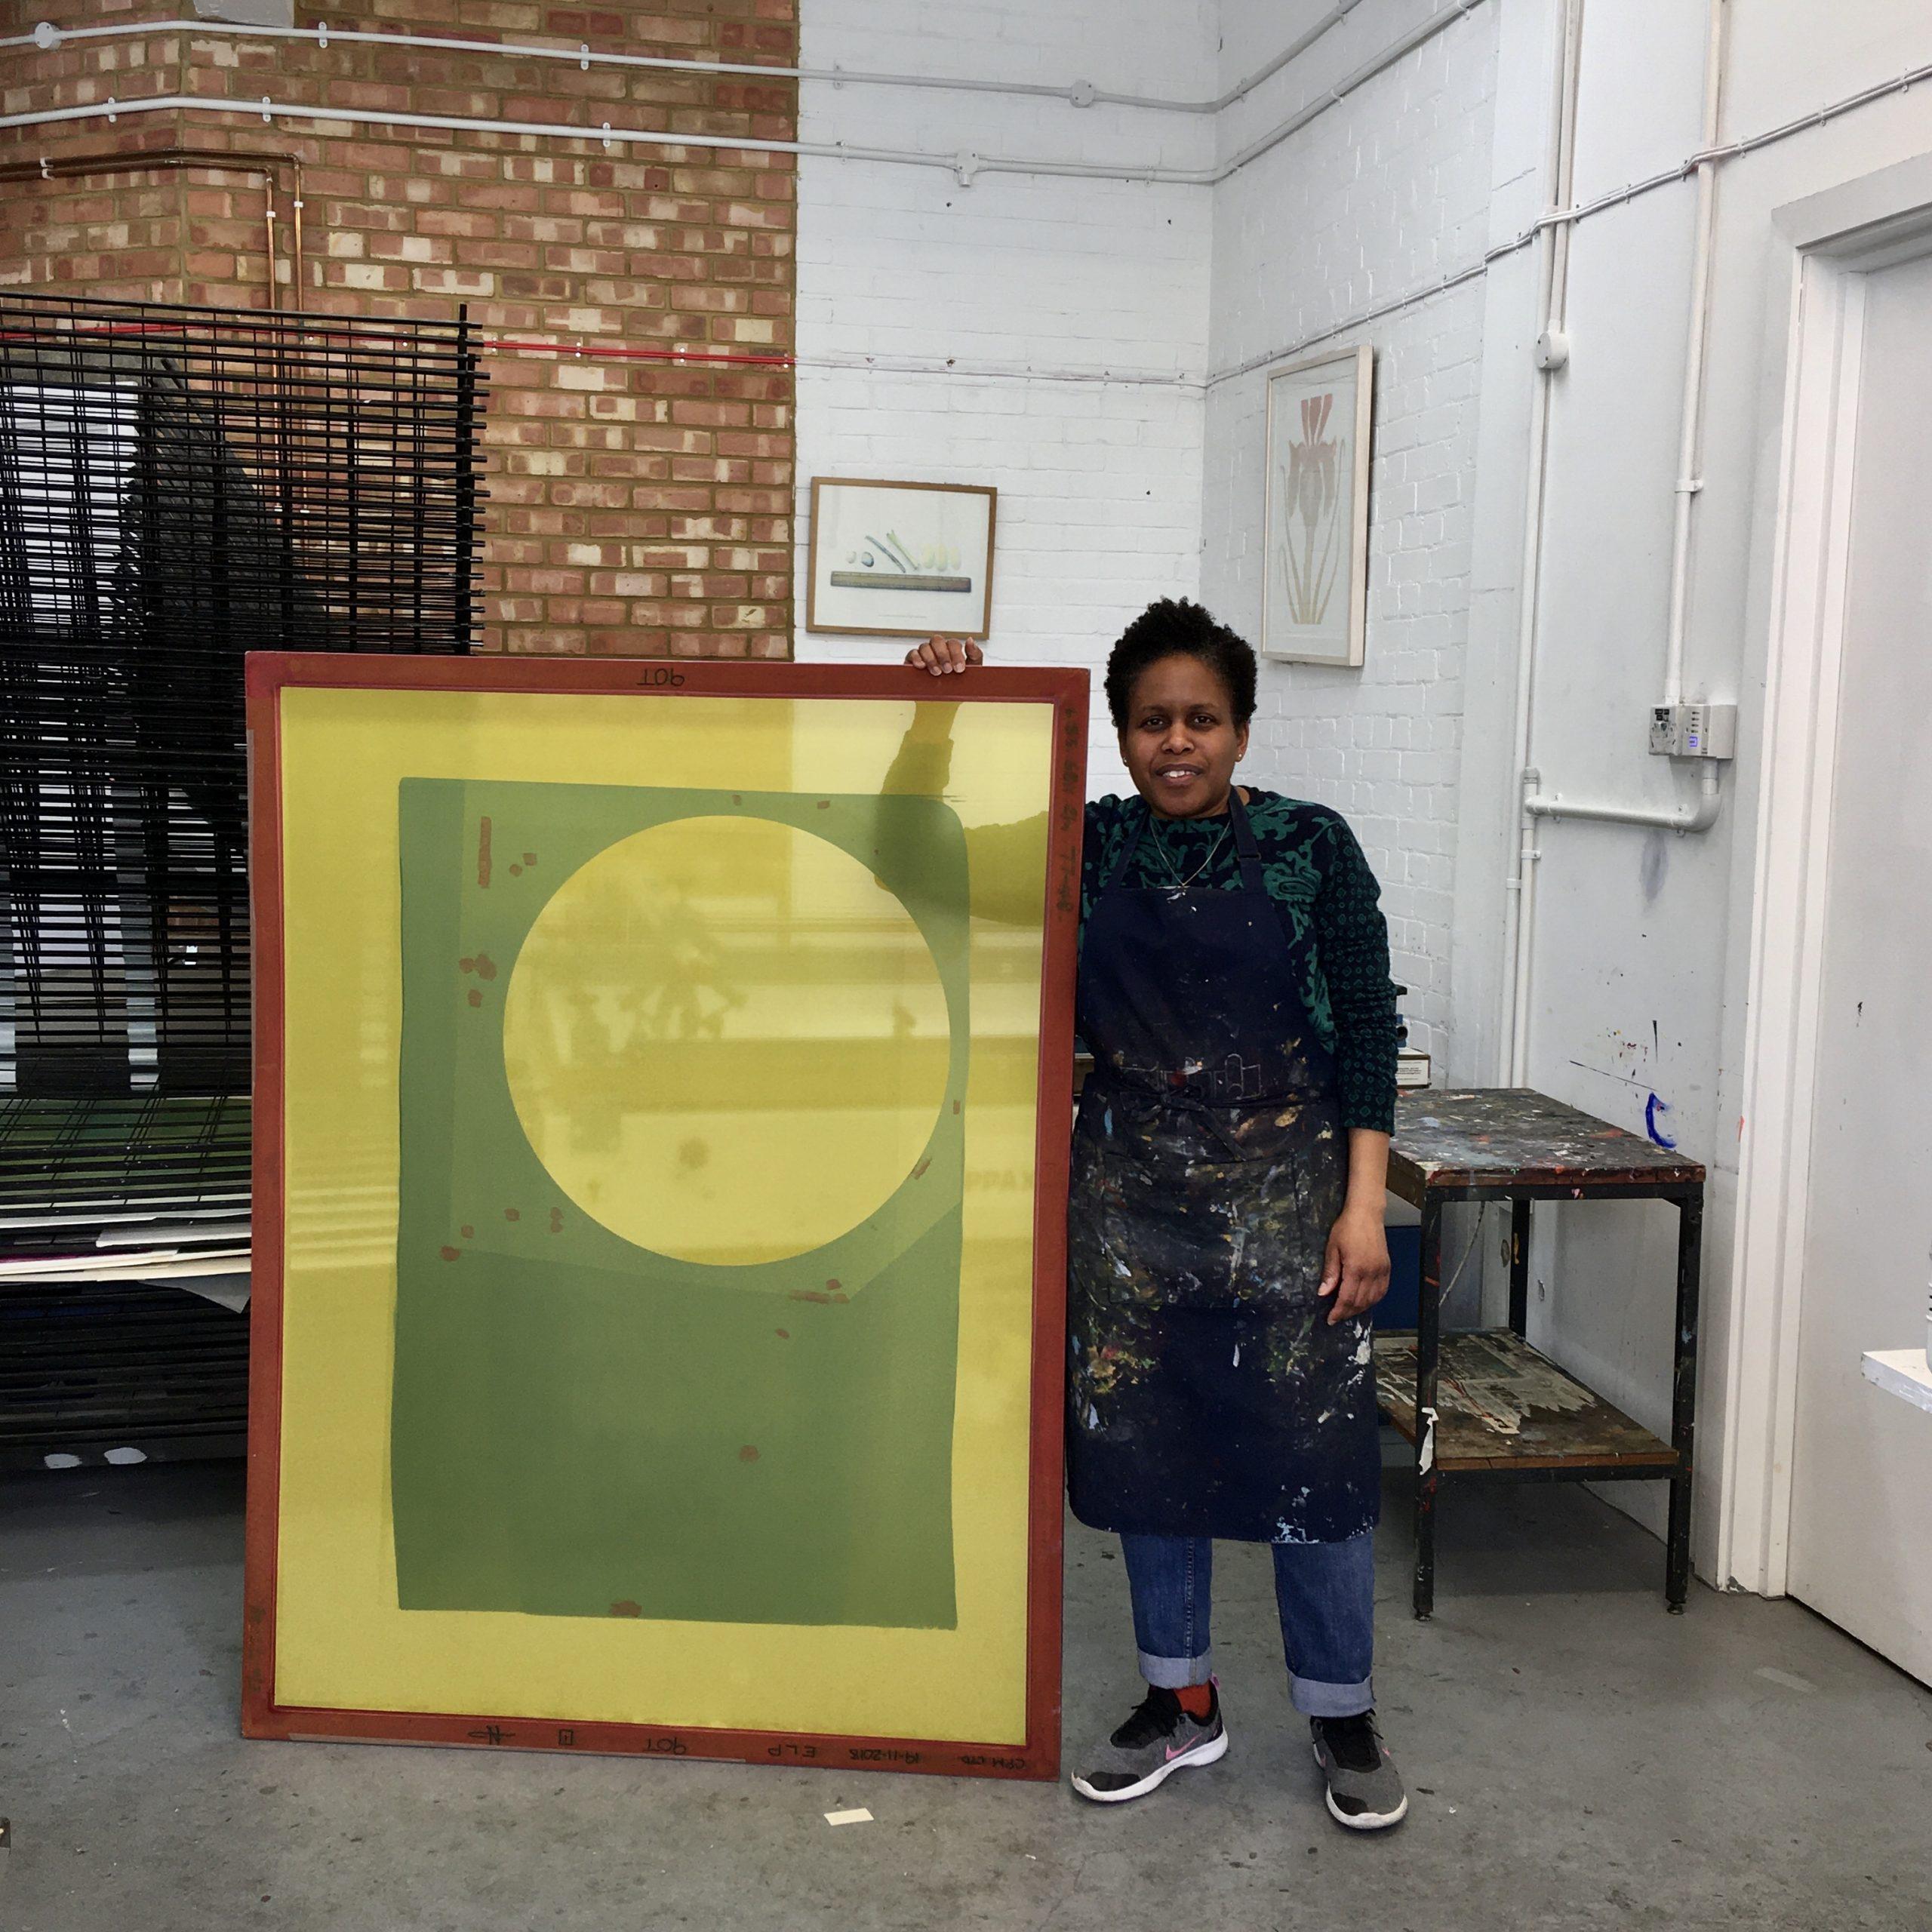 Artists in Quarantine: Jenni Allen - House of Prints